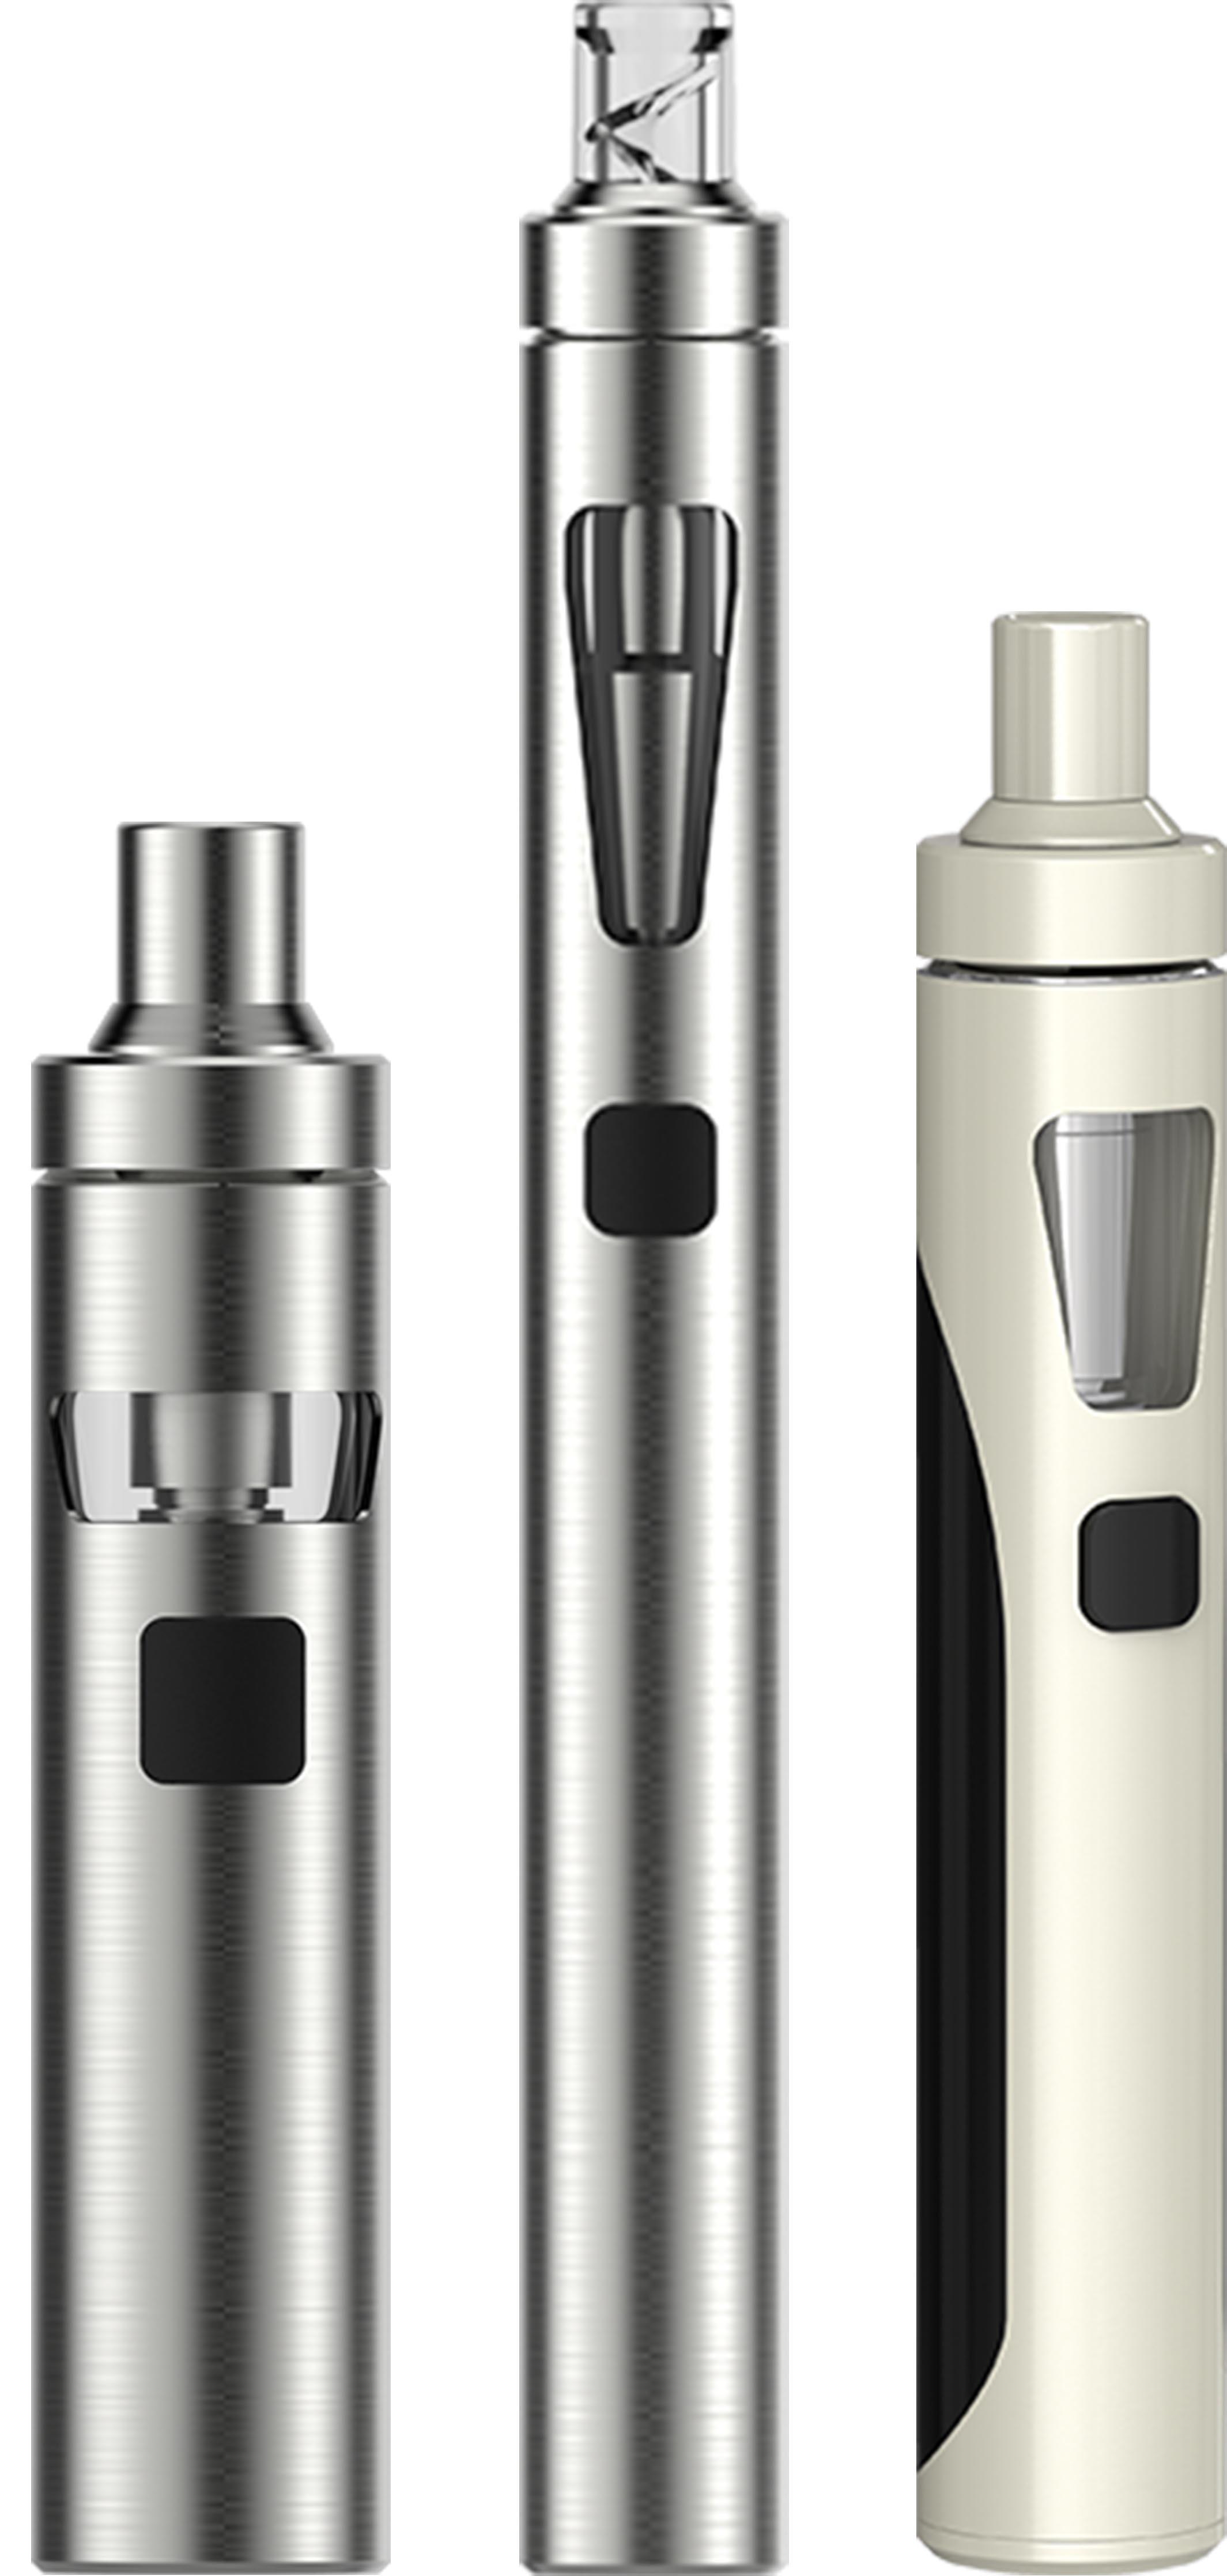 Rozměry elektronických cigaret eGo AIO